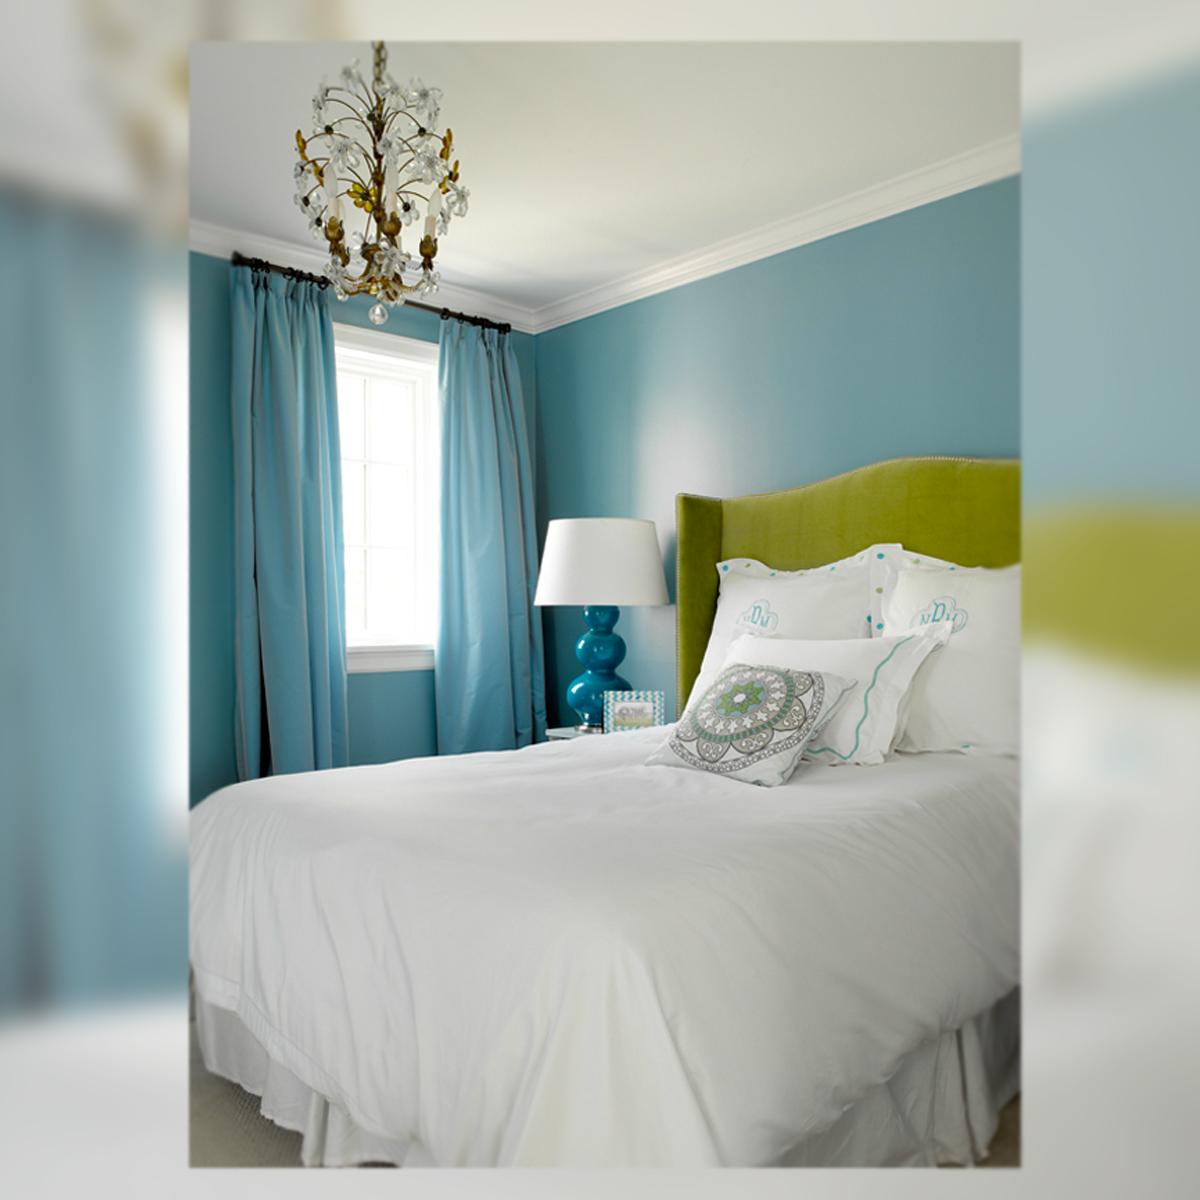 Bedroom Decor Love